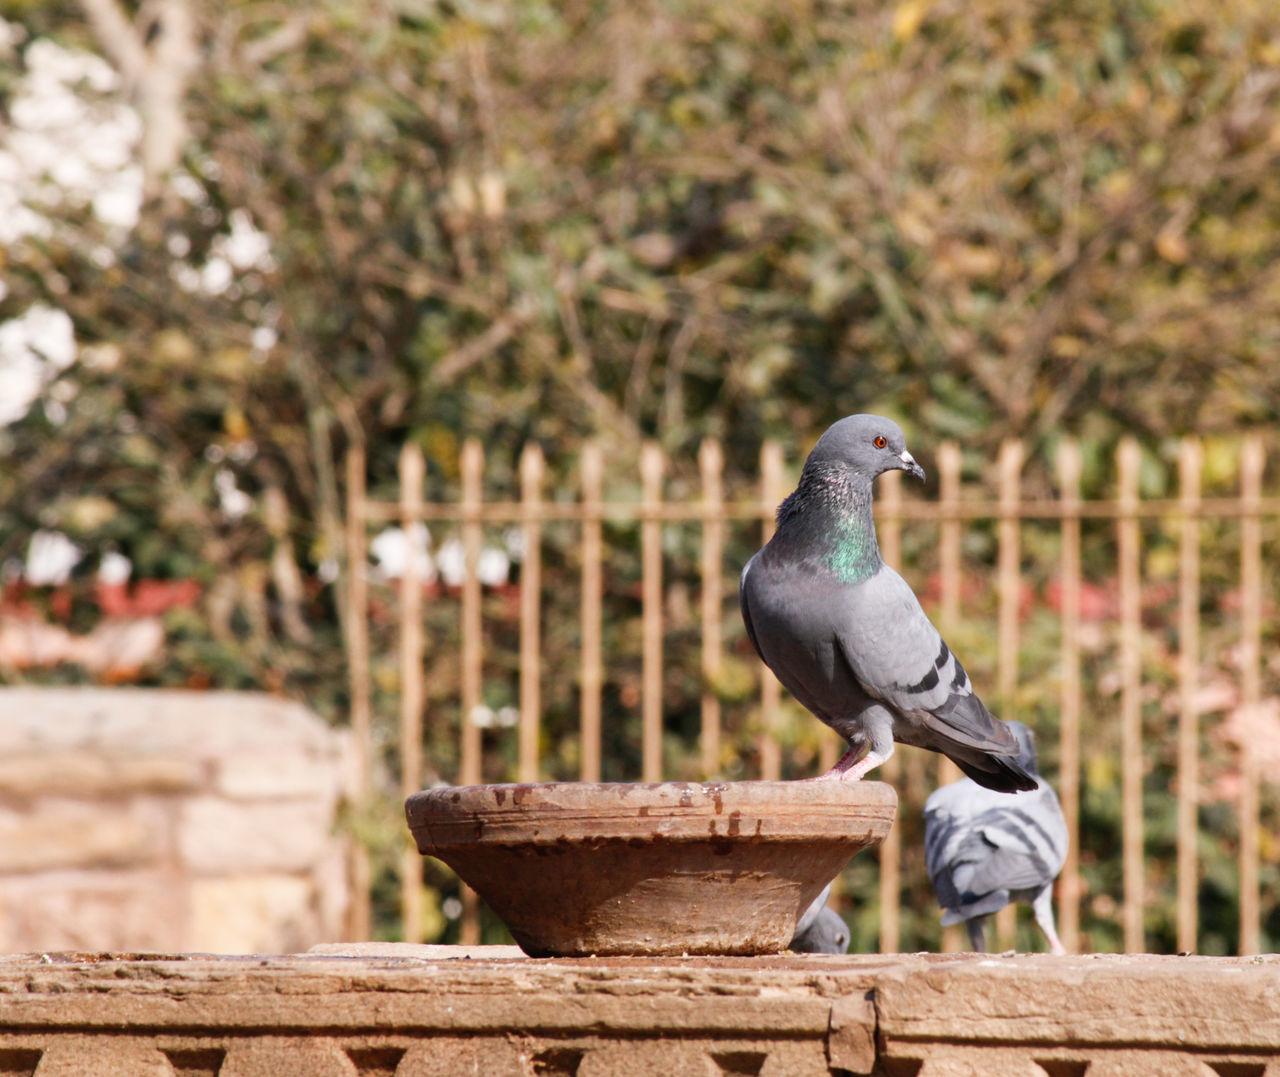 Bird Animal Themes Outdoors Perching Pigeons Pigeonslife Pigeon Pose Birdwatching Bird Photography Birds Of EyeEm